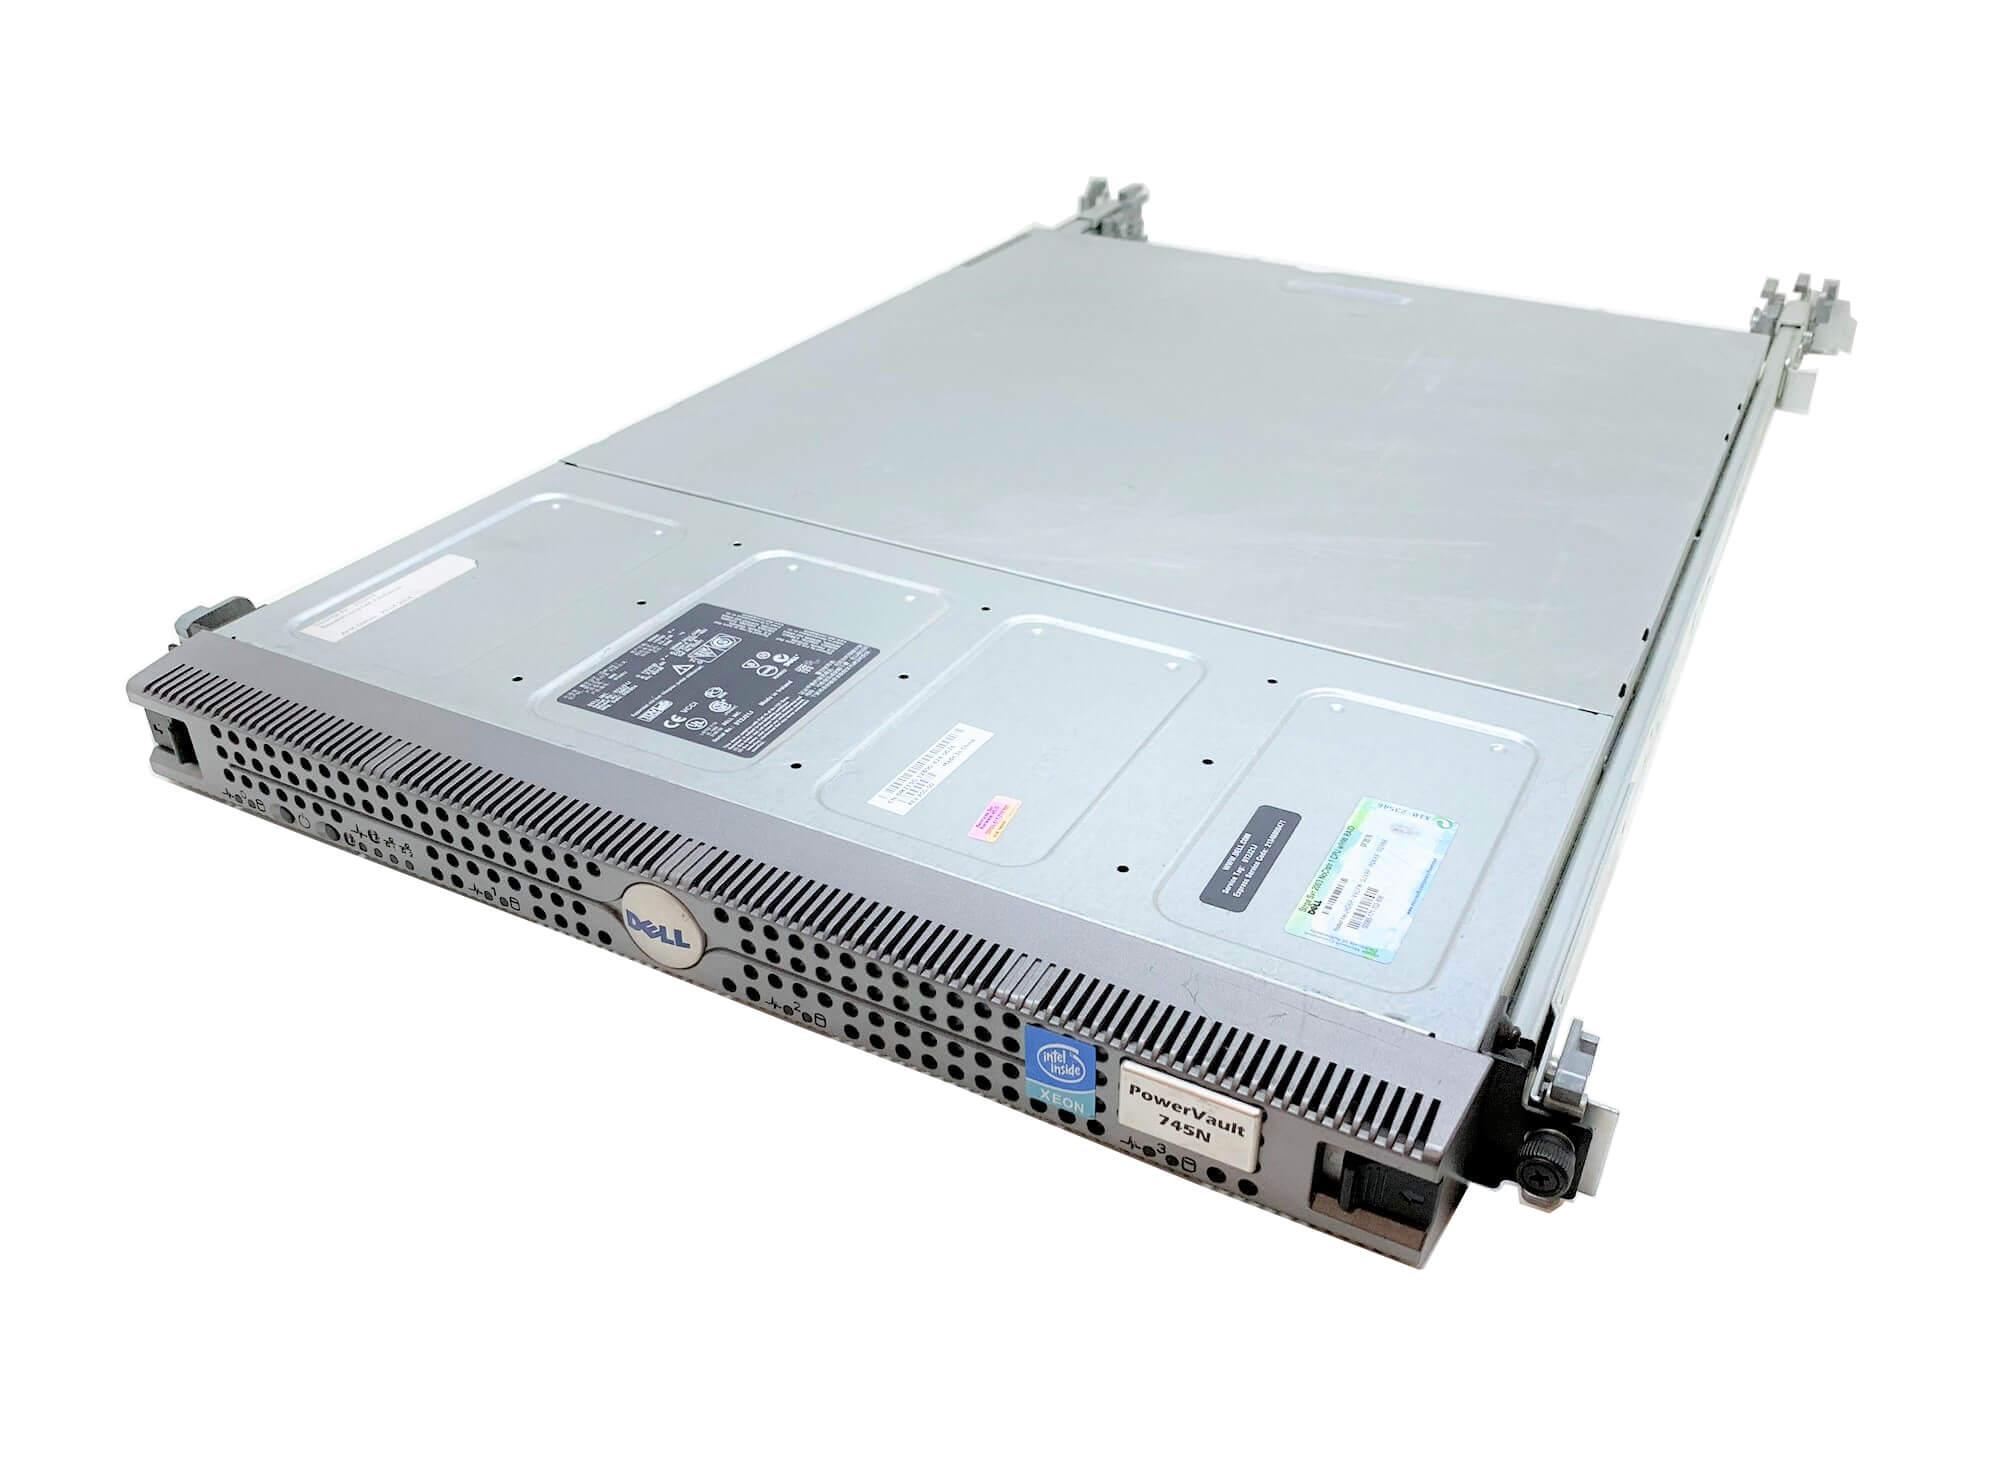 DELL POWERVAULT 745N PENTIUM 4 2,8 / 1 GB DDR1 ECC / WINDOWS 2003 STORAGE RAID COA / 2U